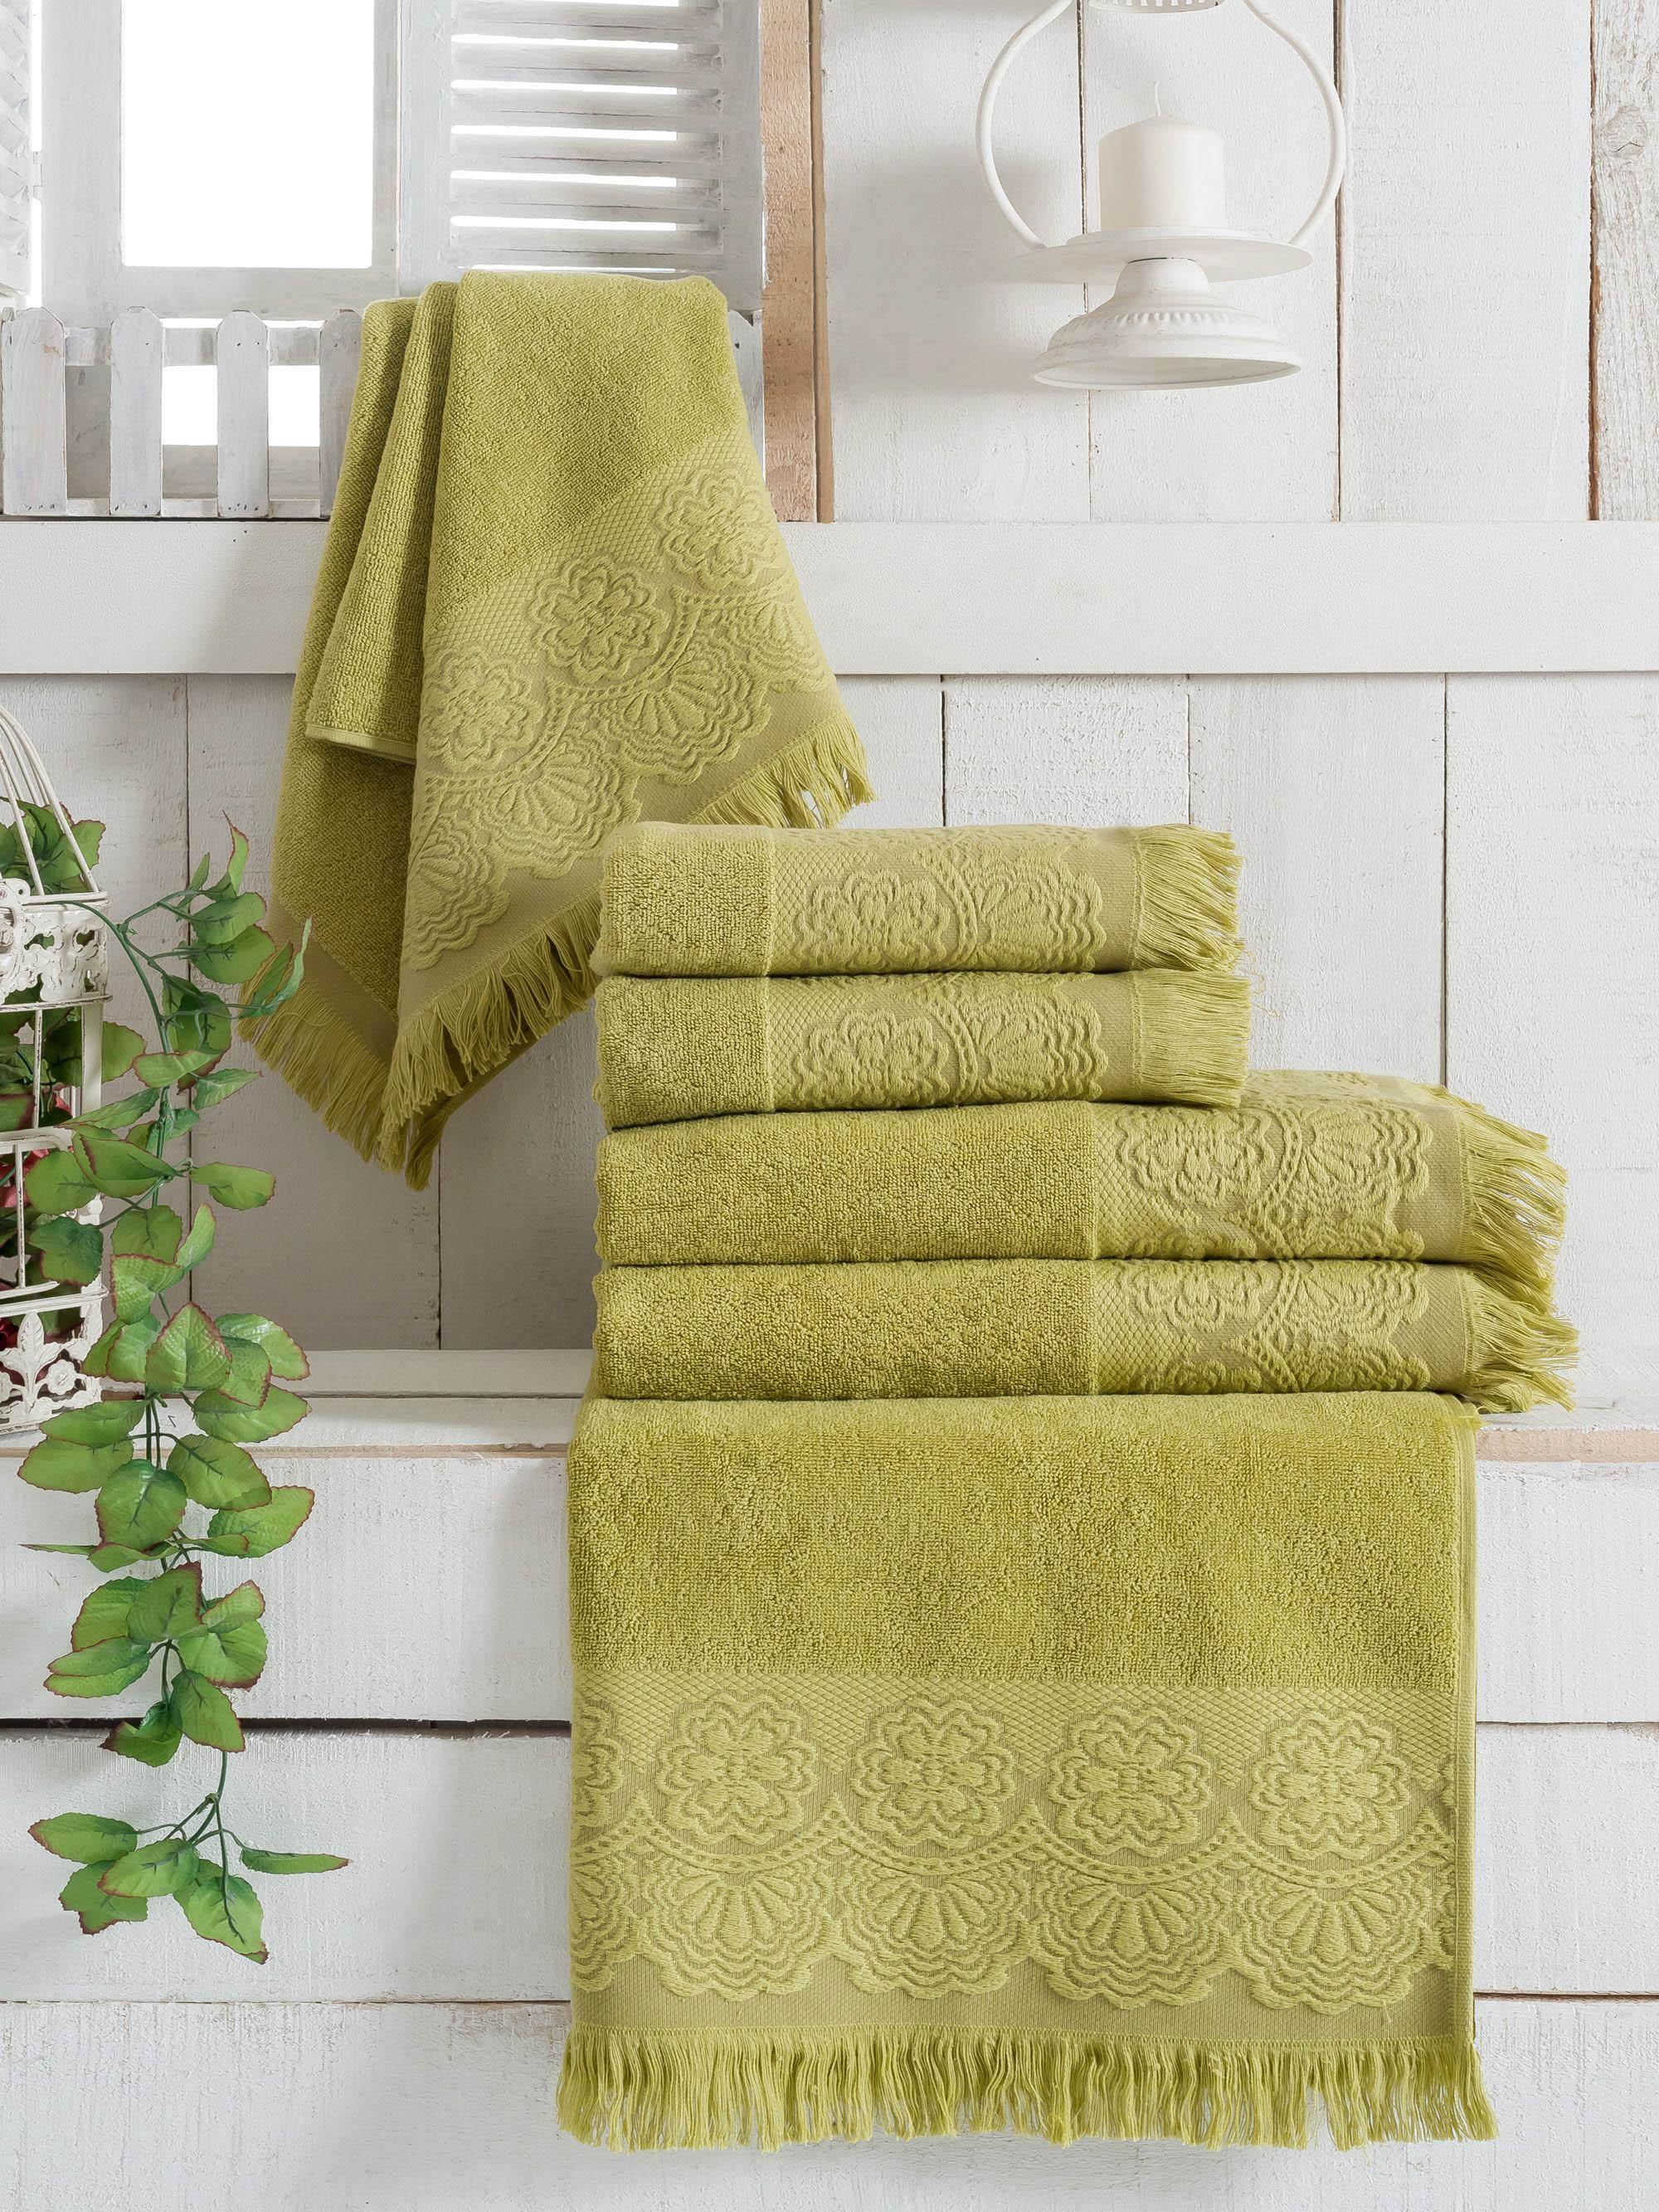 Полотенца Sokuculer Полотенце Zara Цвет: Зеленый (50х90 см - 3 шт) pasta zara бабочки макароны 500 г